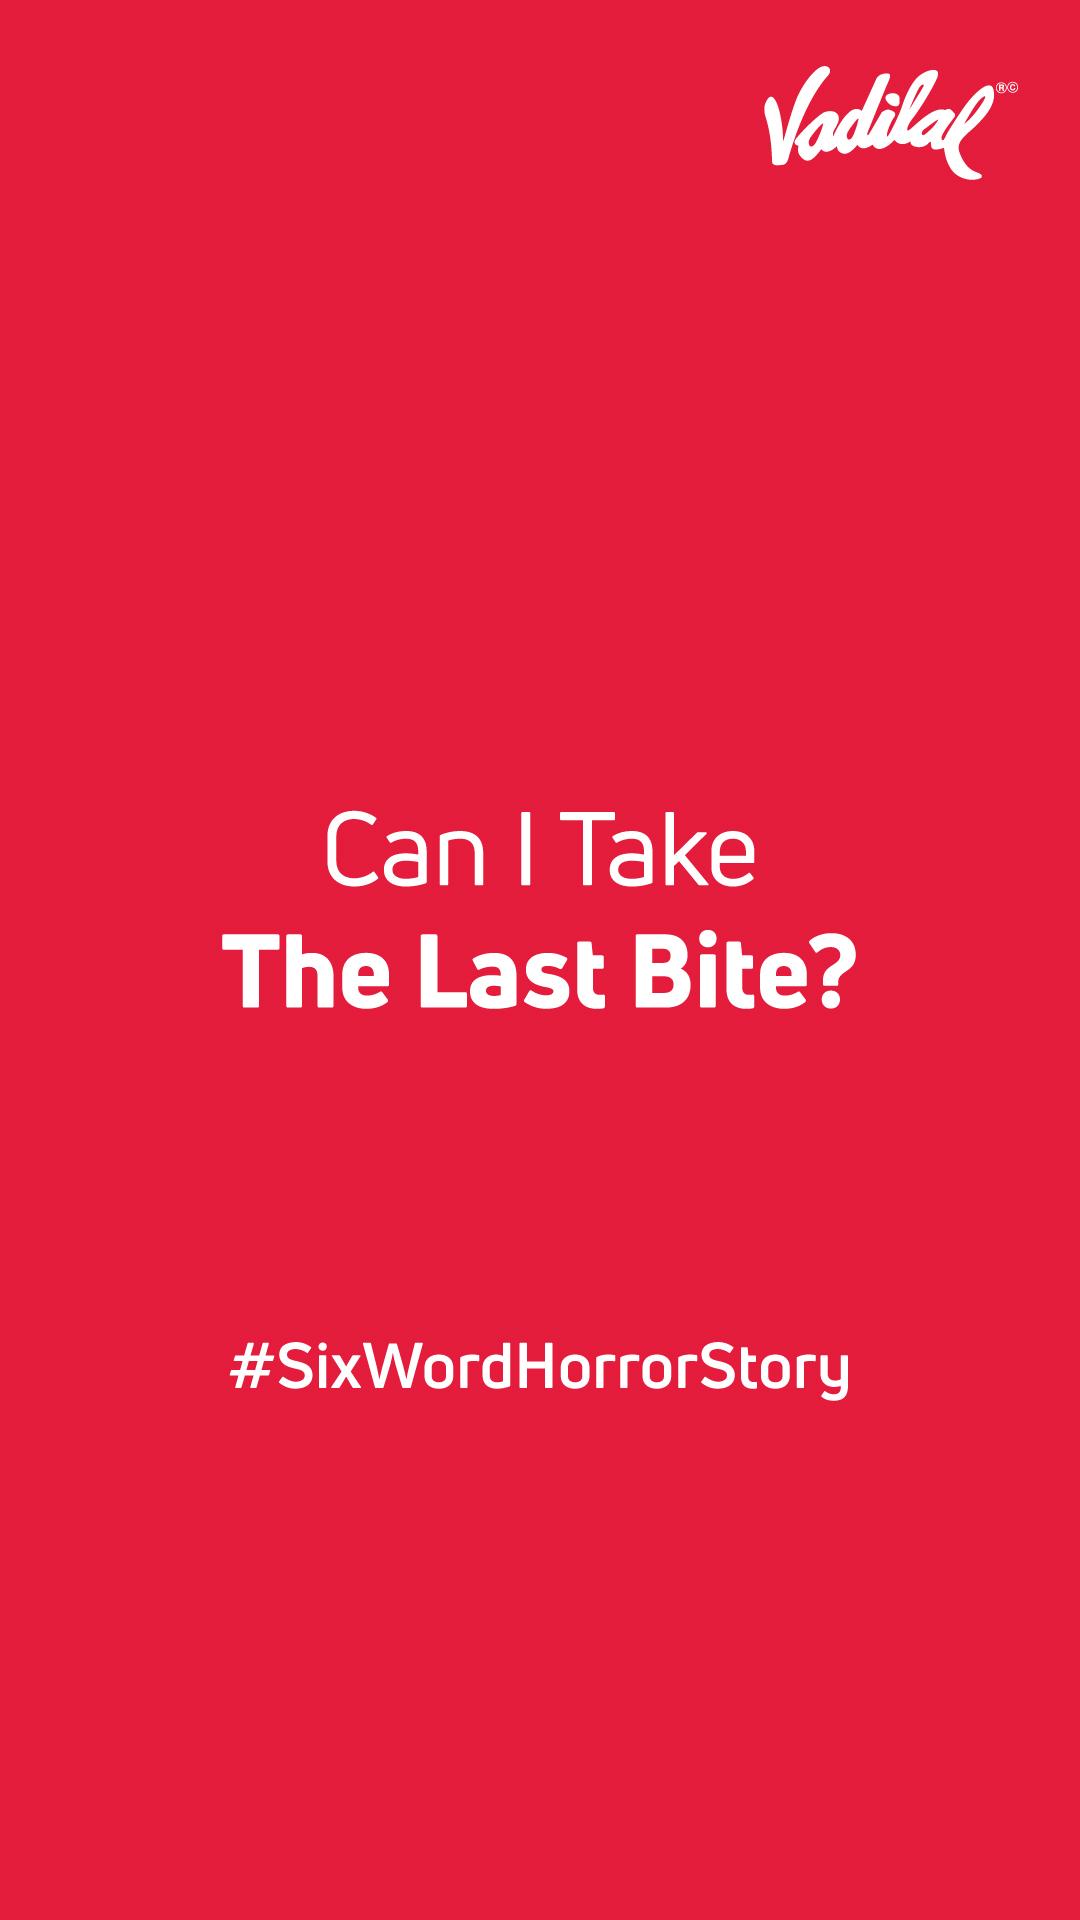 Brand #SixWordHorrorStory